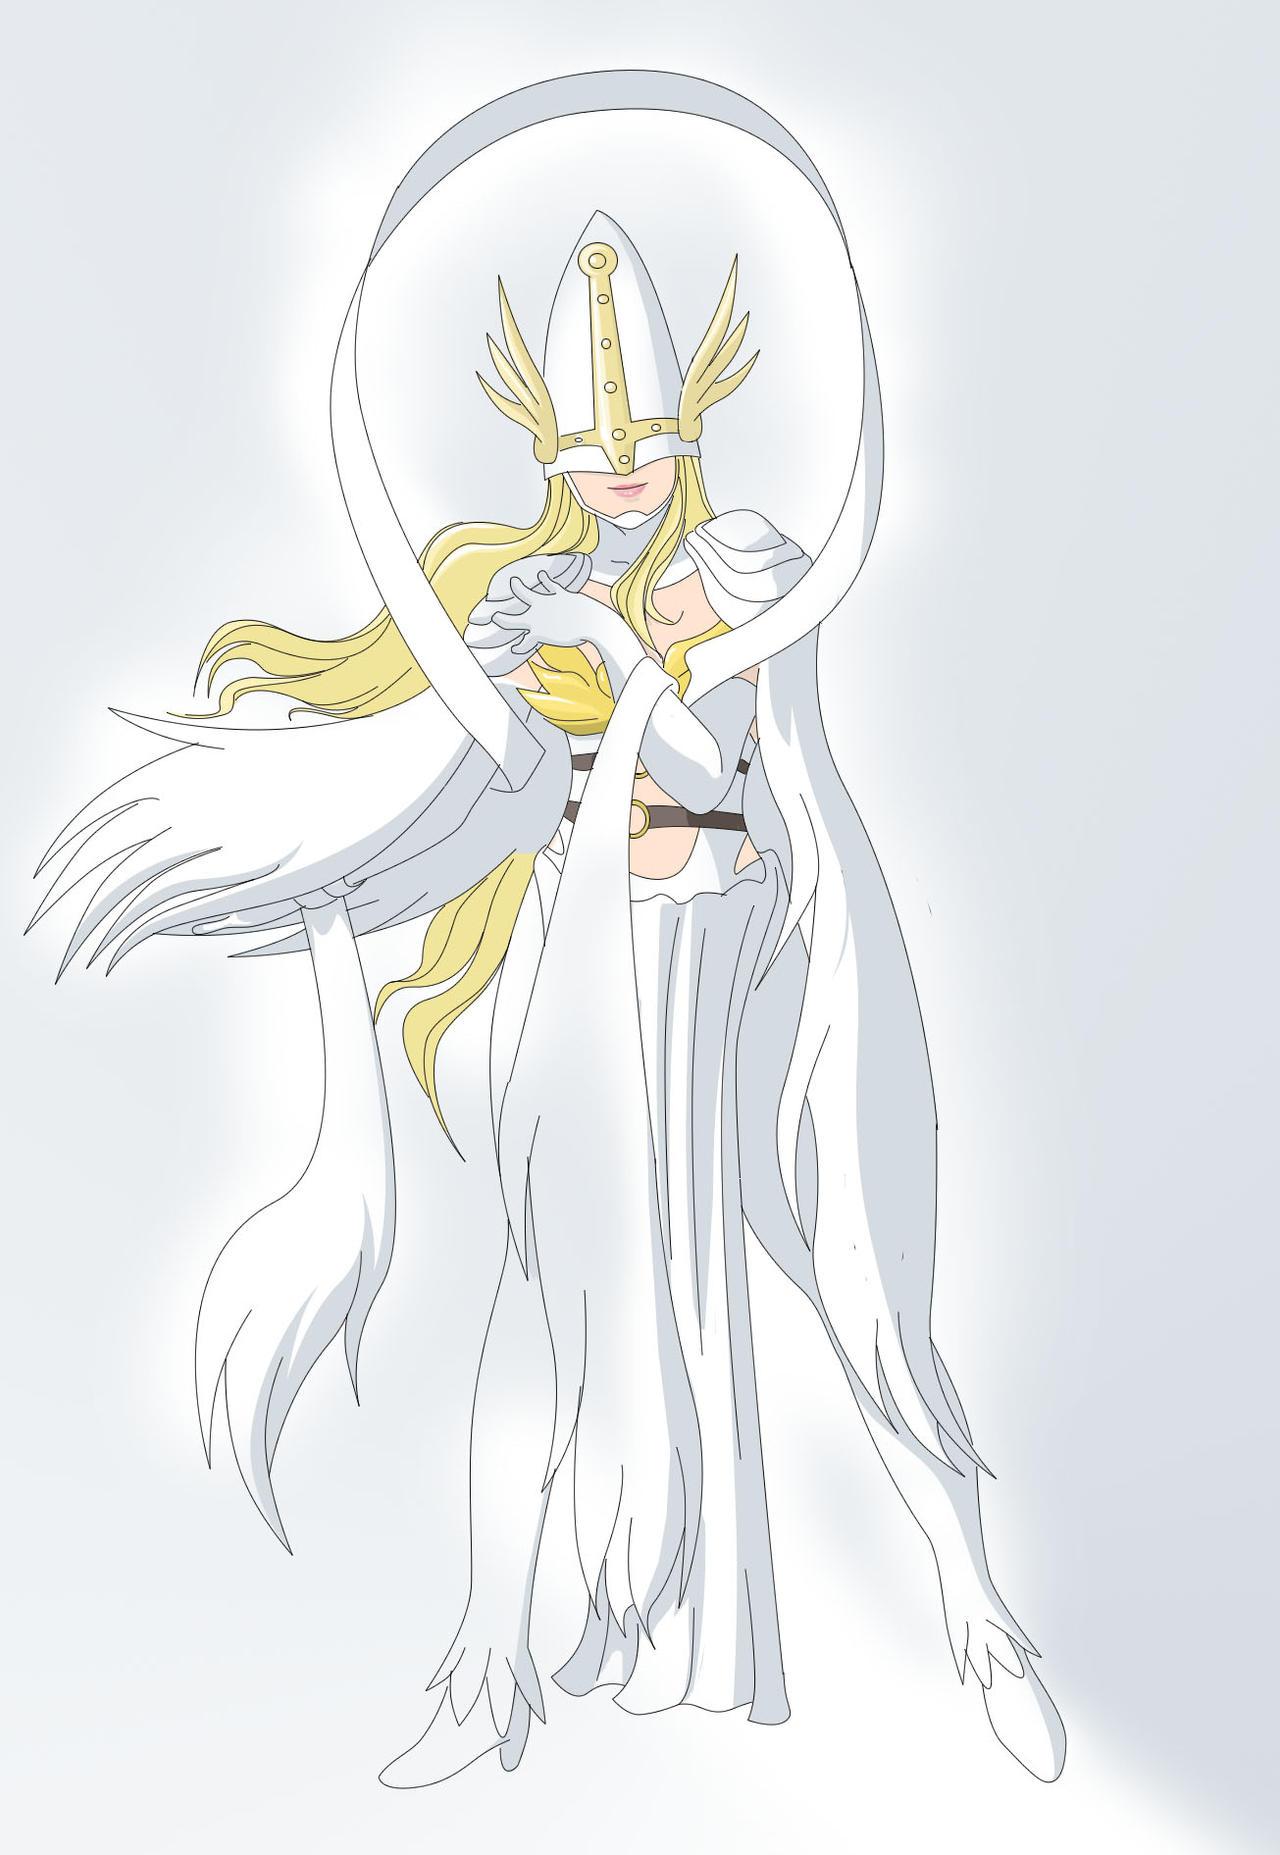 Lady Angewomon III by Ayhelenk